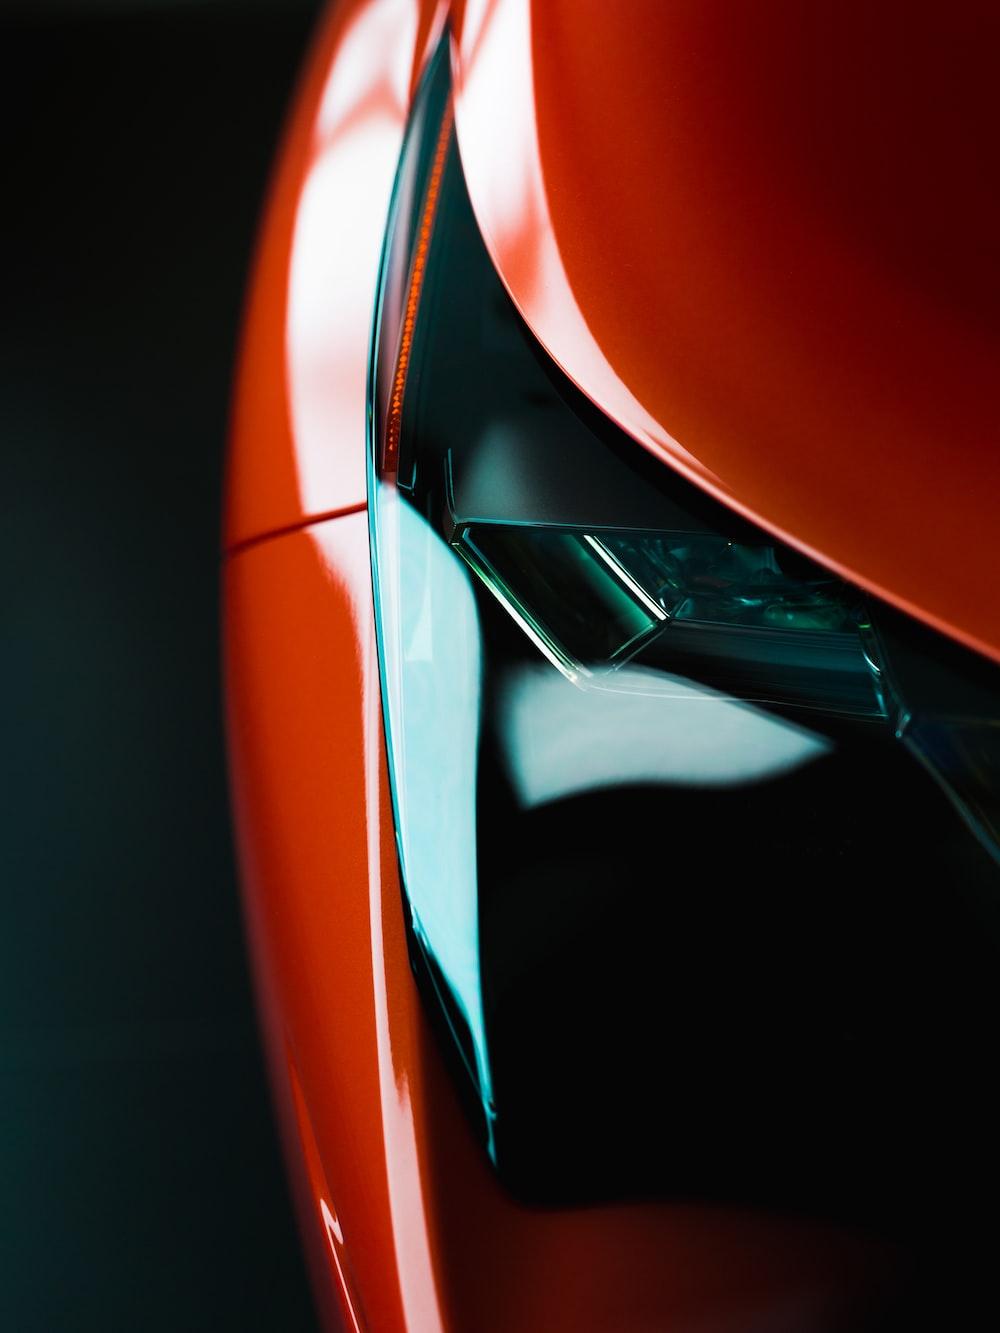 Lexus Nx Studio Shot 2017 Like M Hd Photo By Art Lasovsky